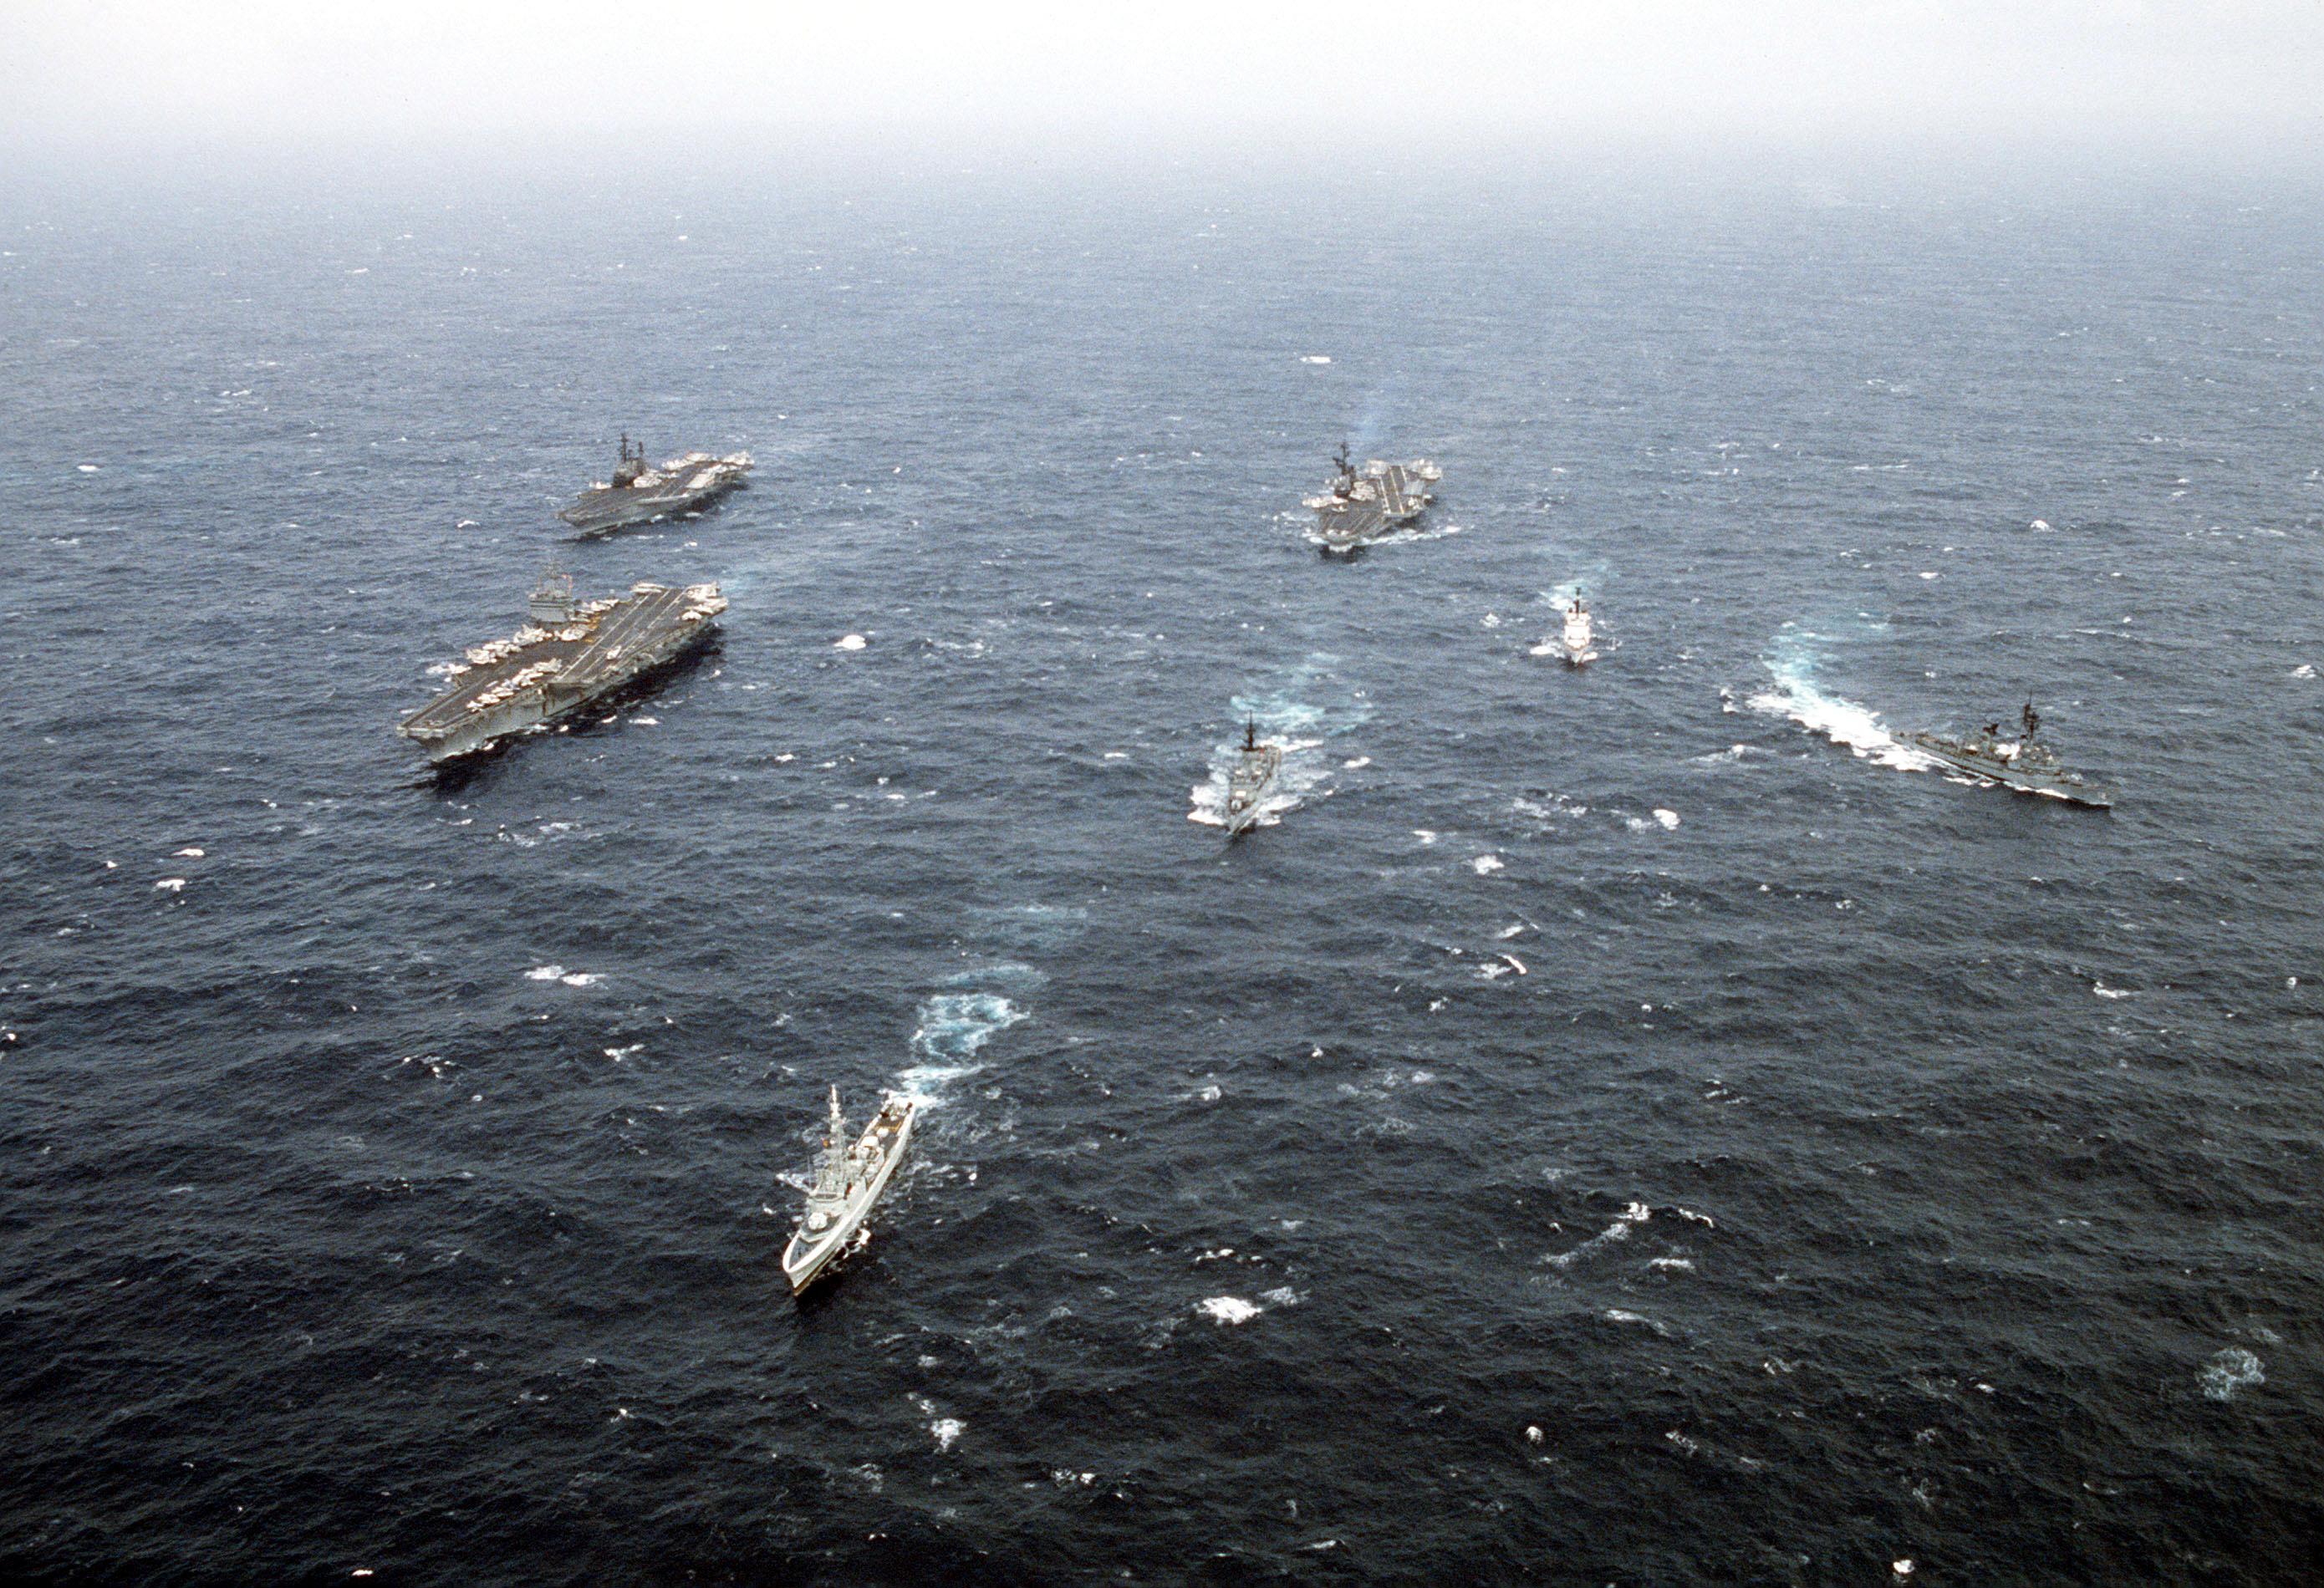 41 Uss Uss 43 Uss Enterprise Cv 65 Sea Cv Midway Cv Coral